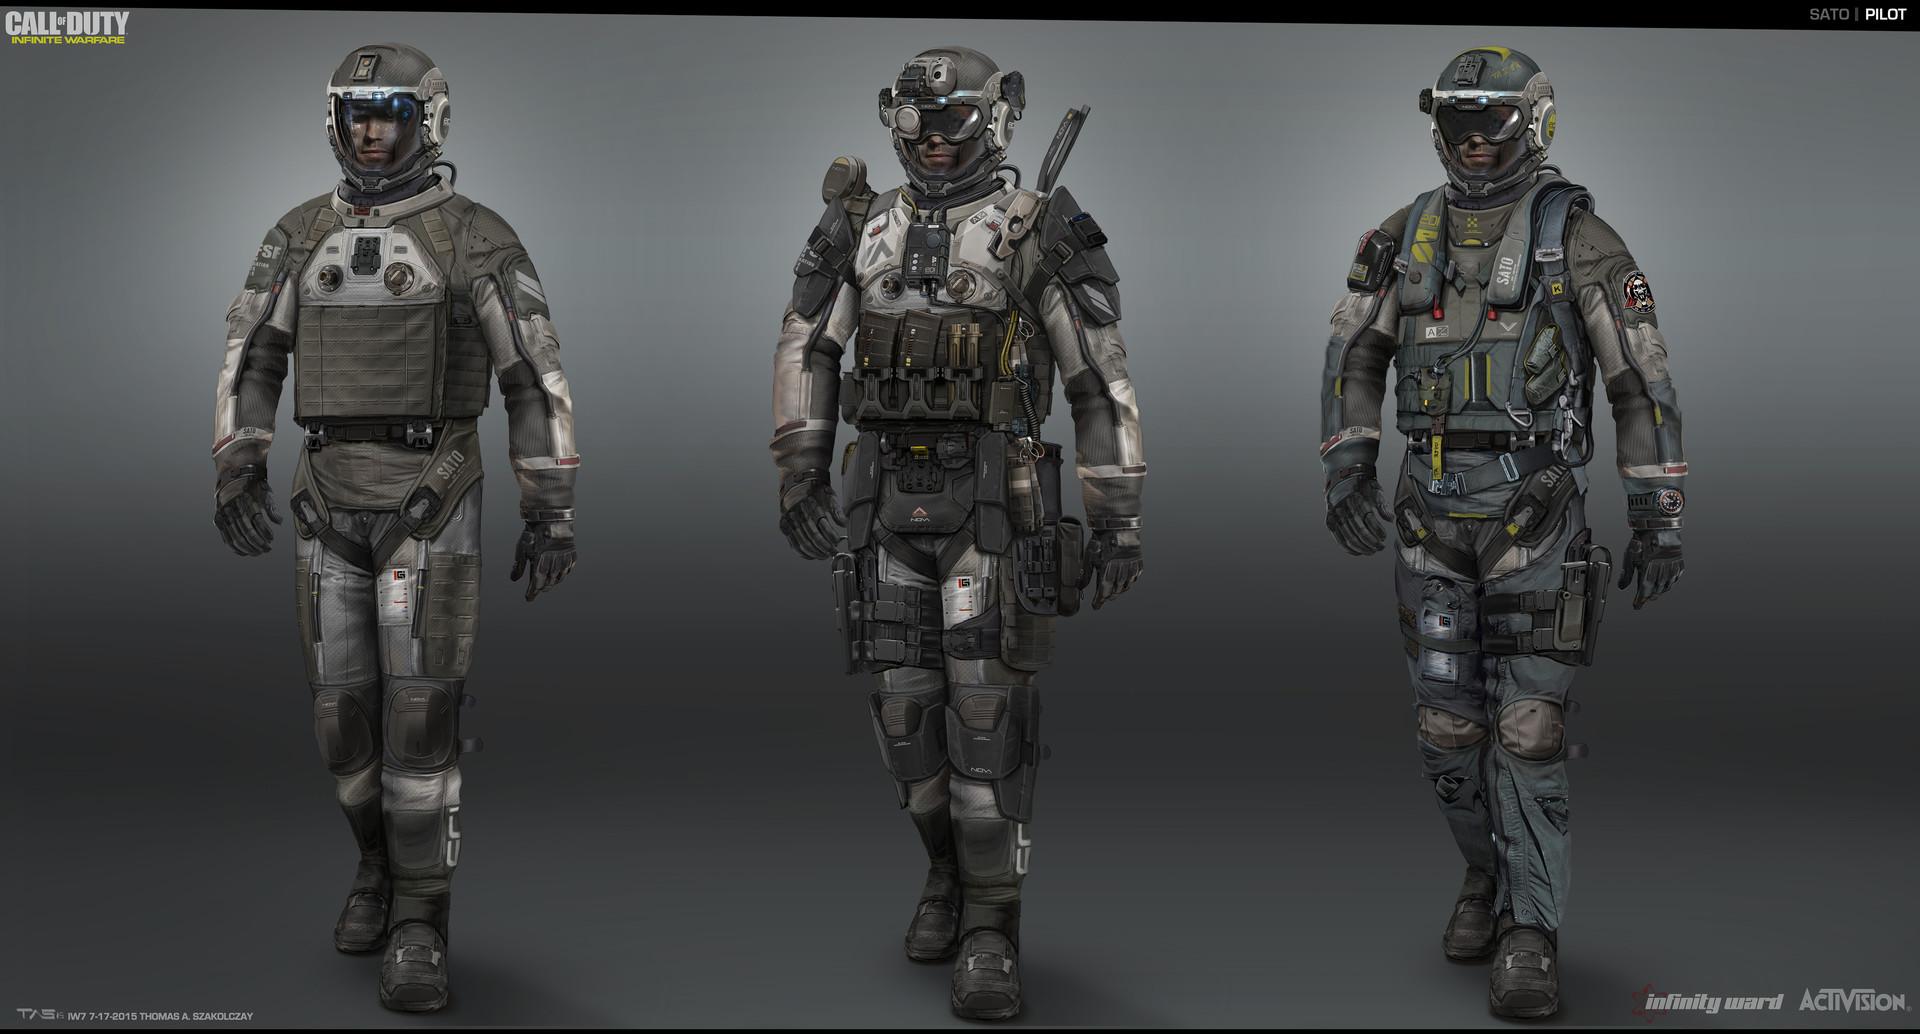 Basic SATO Pilot Designs